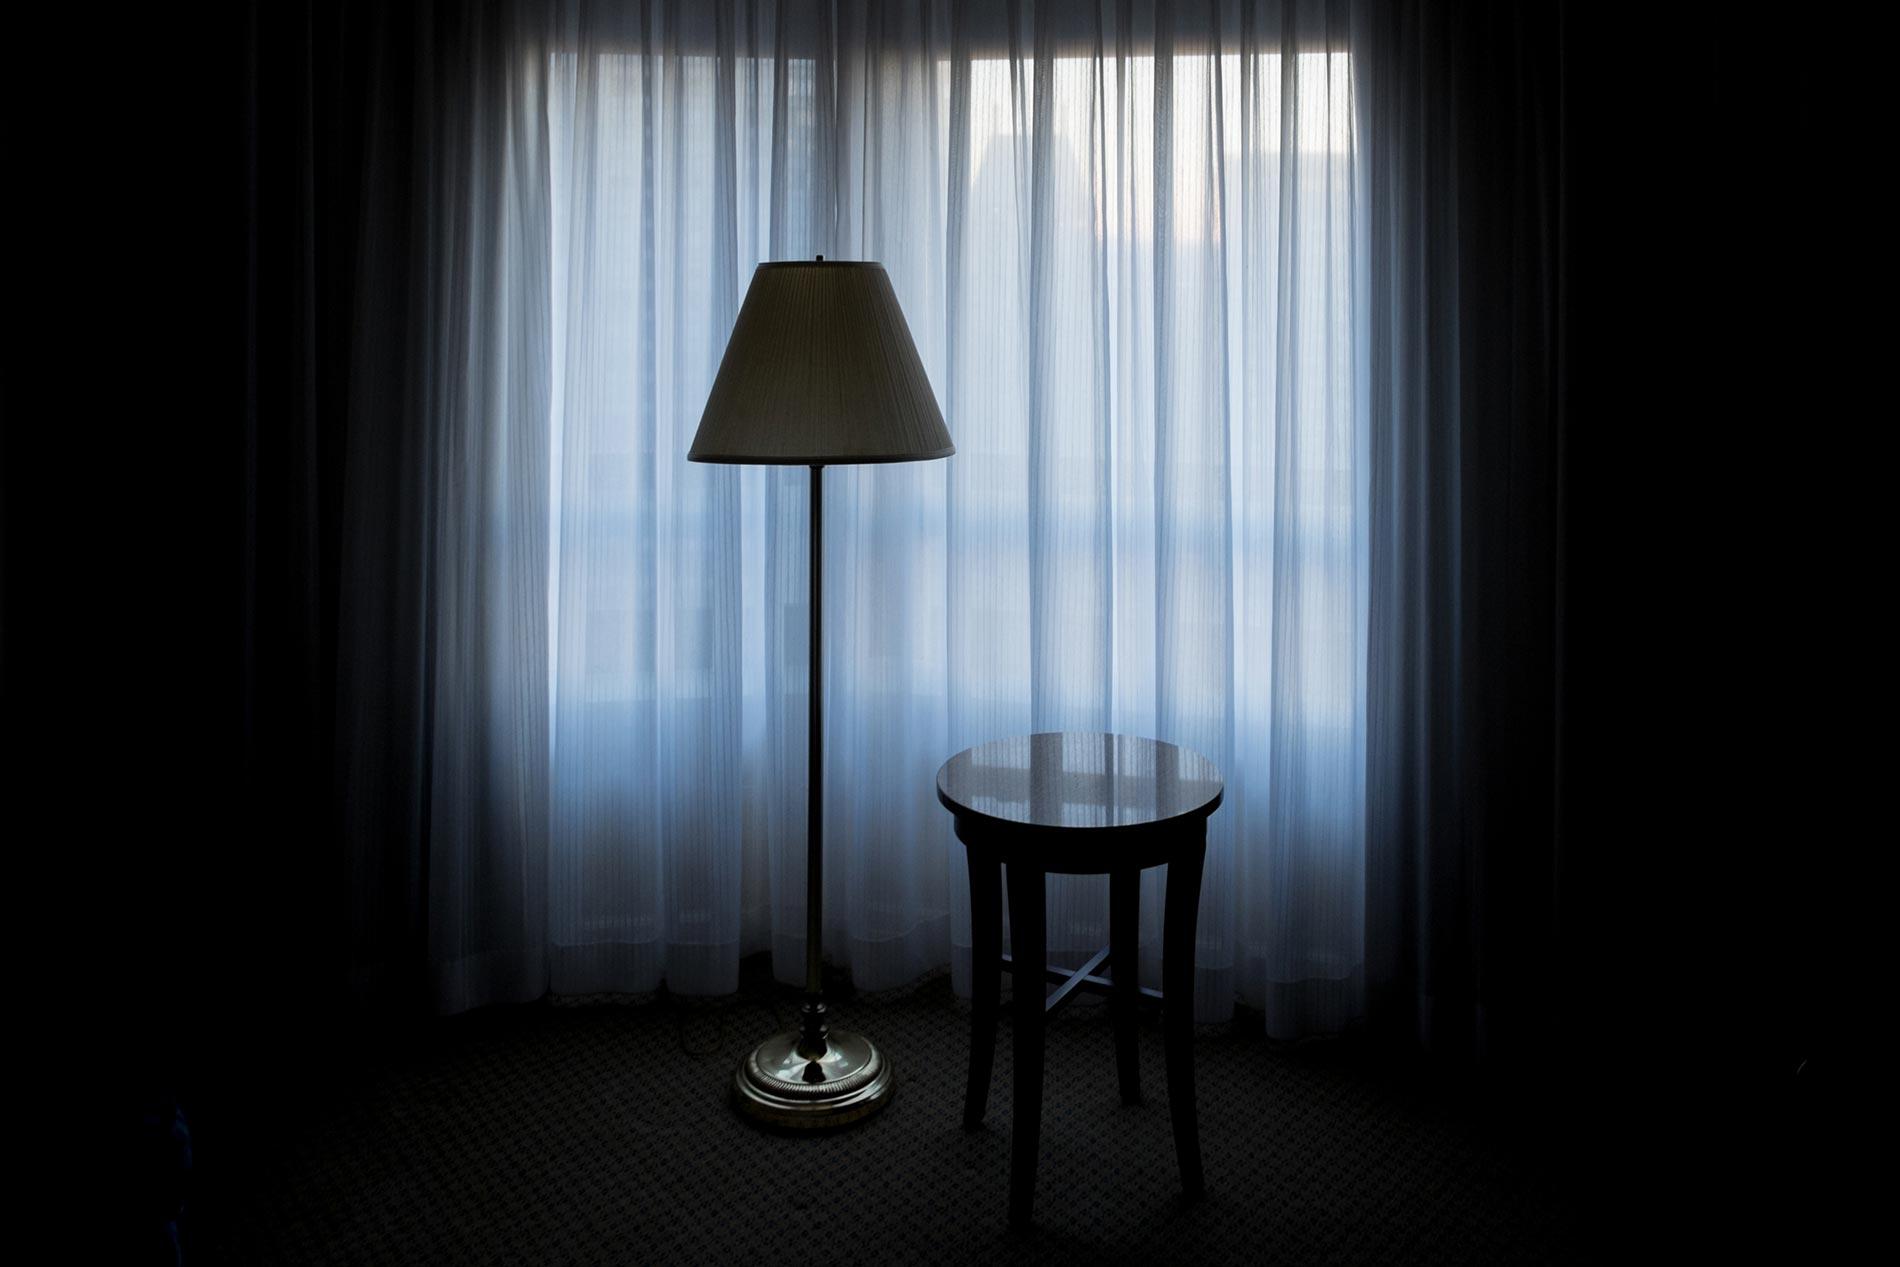 Hotel room window - New York